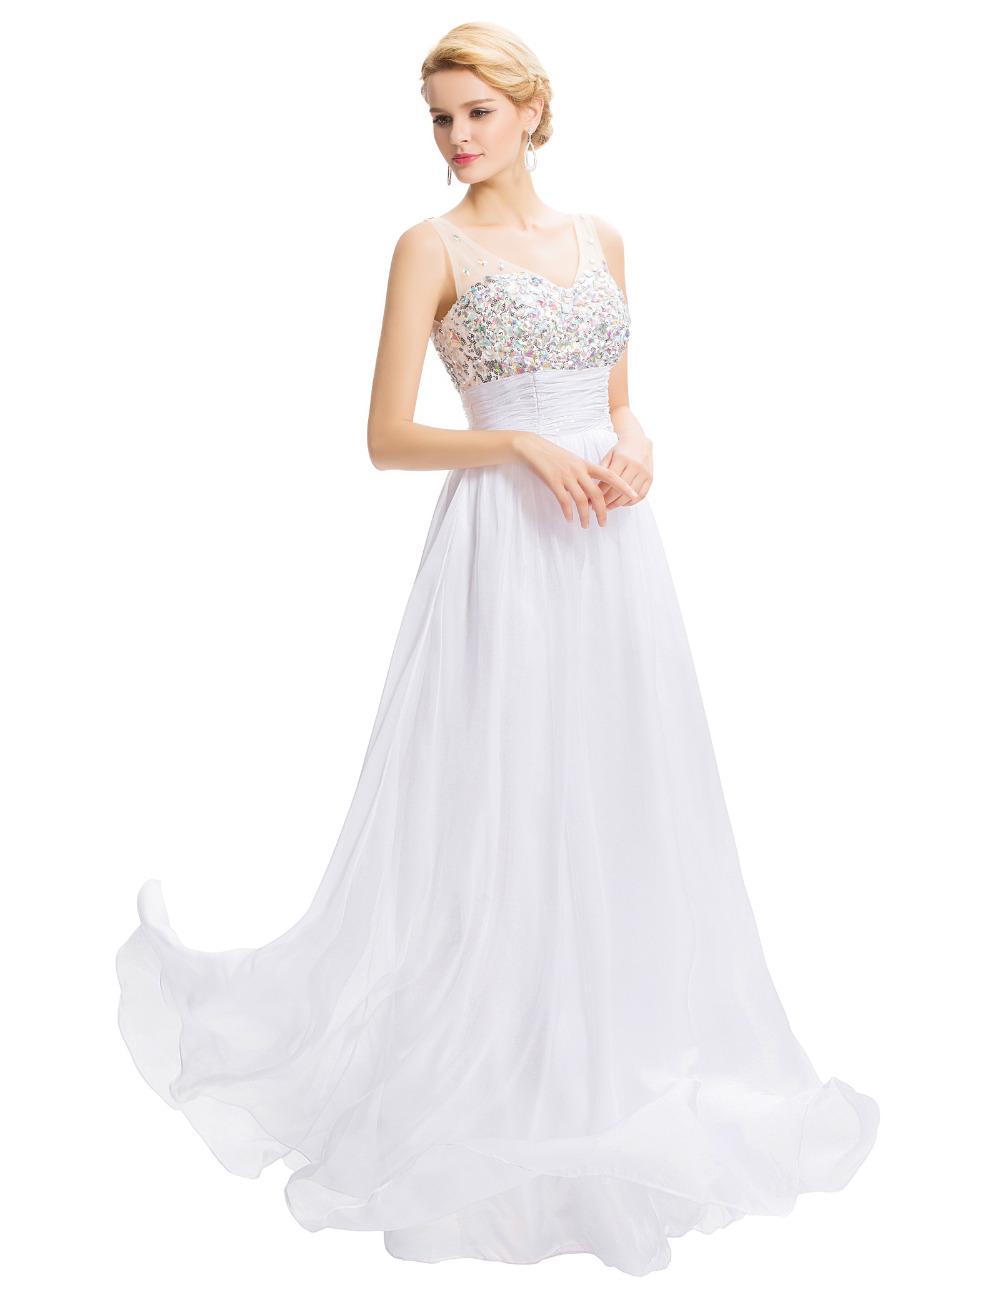 Cheap Vestido De Festa Longo 2016 Elegant long evening dresses white blue V neck Beaded Robe De Soiree Longue Abendkleider(China (Mainland))